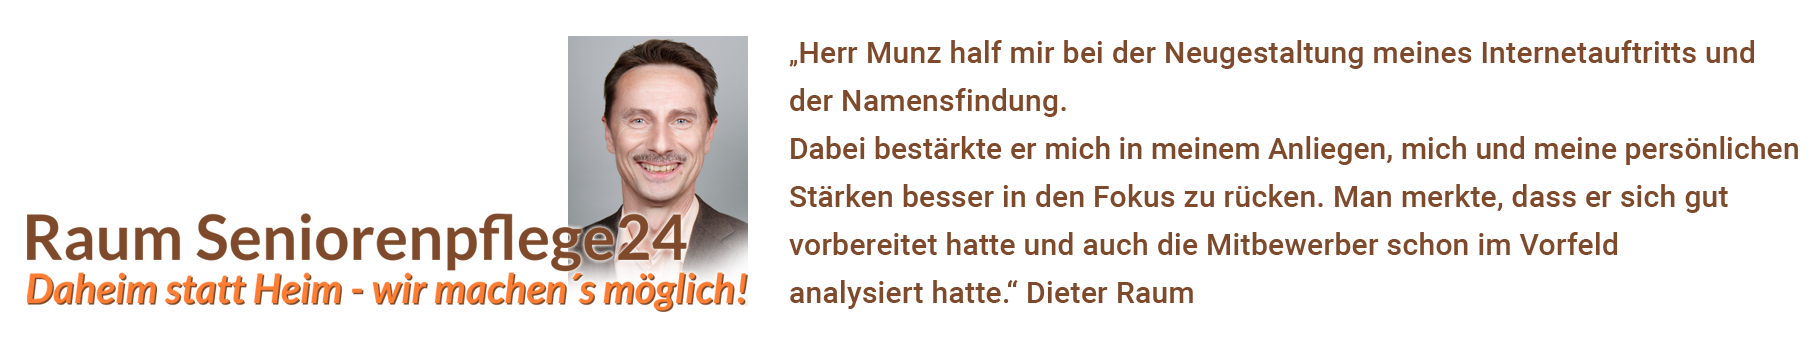 Referenz, Dieter Raum Seniorenservice, Weissach im Tal bei Backnang